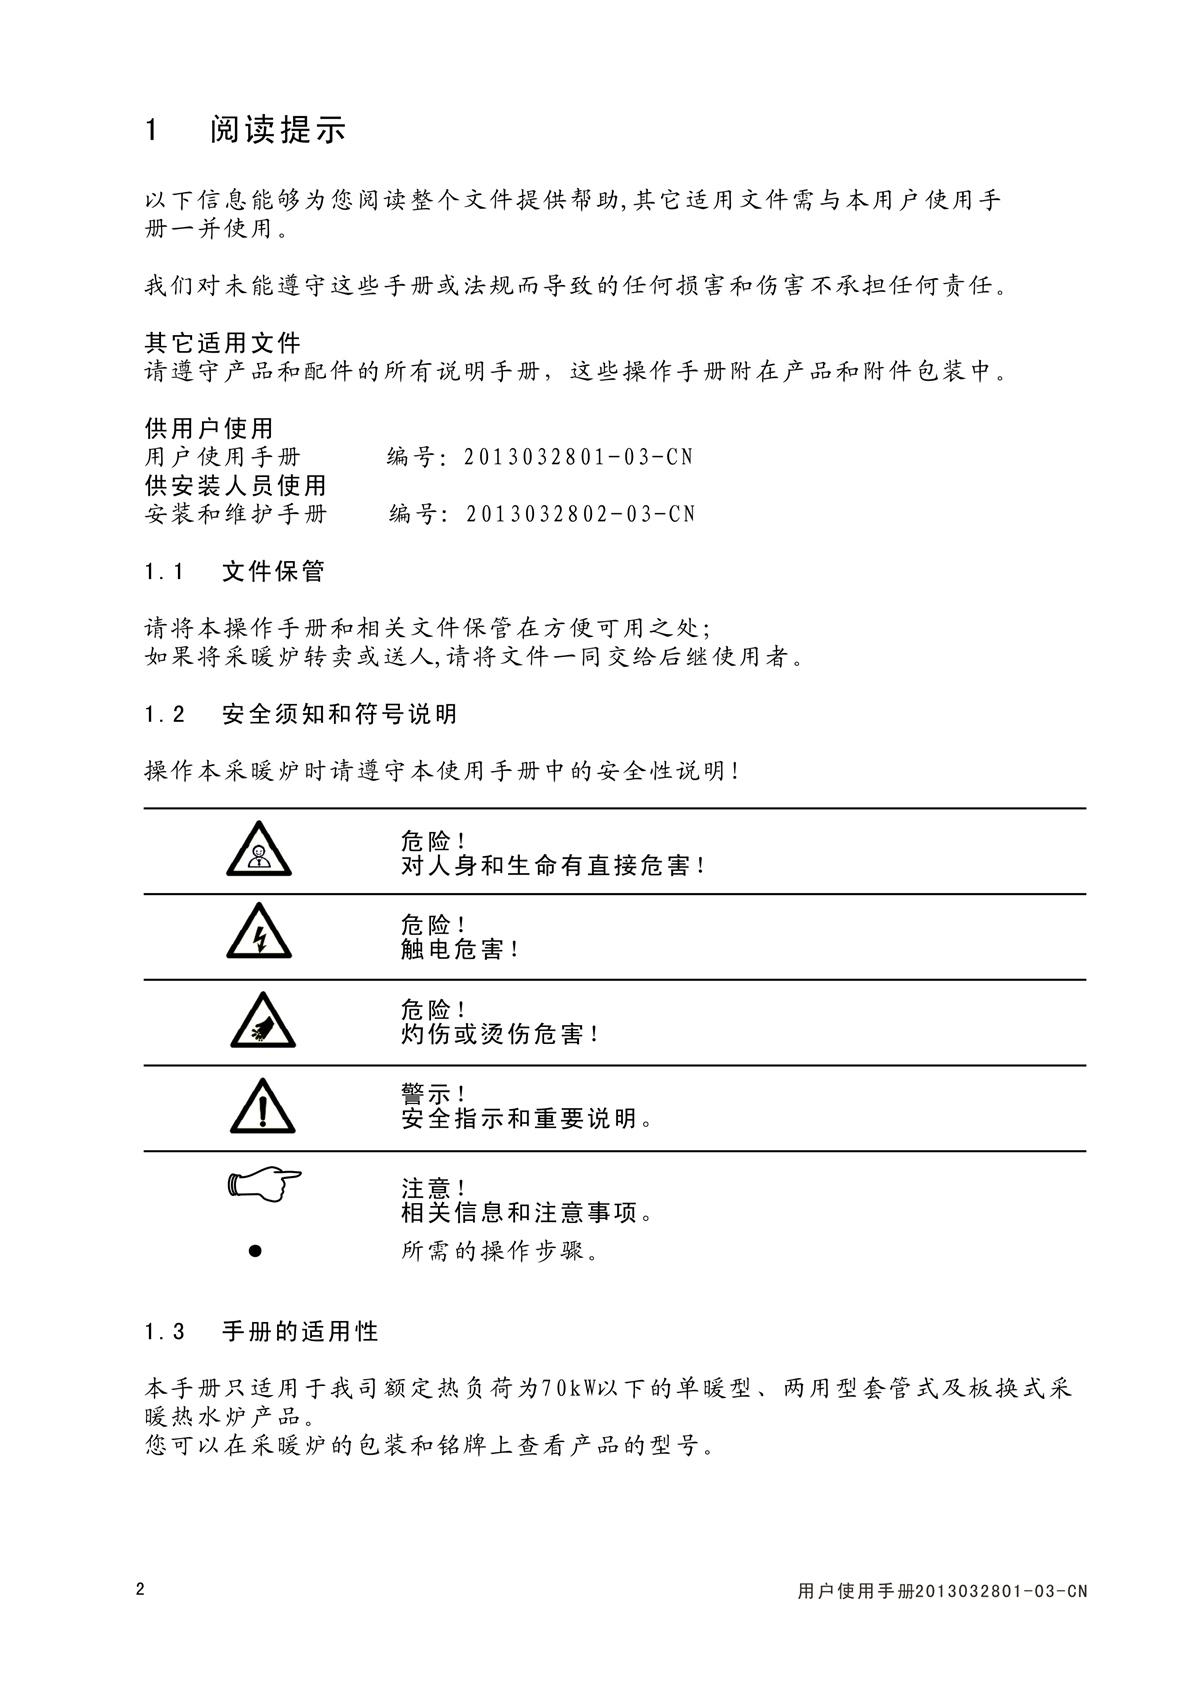 ES02系列-用户使用手册-3_01.jpg